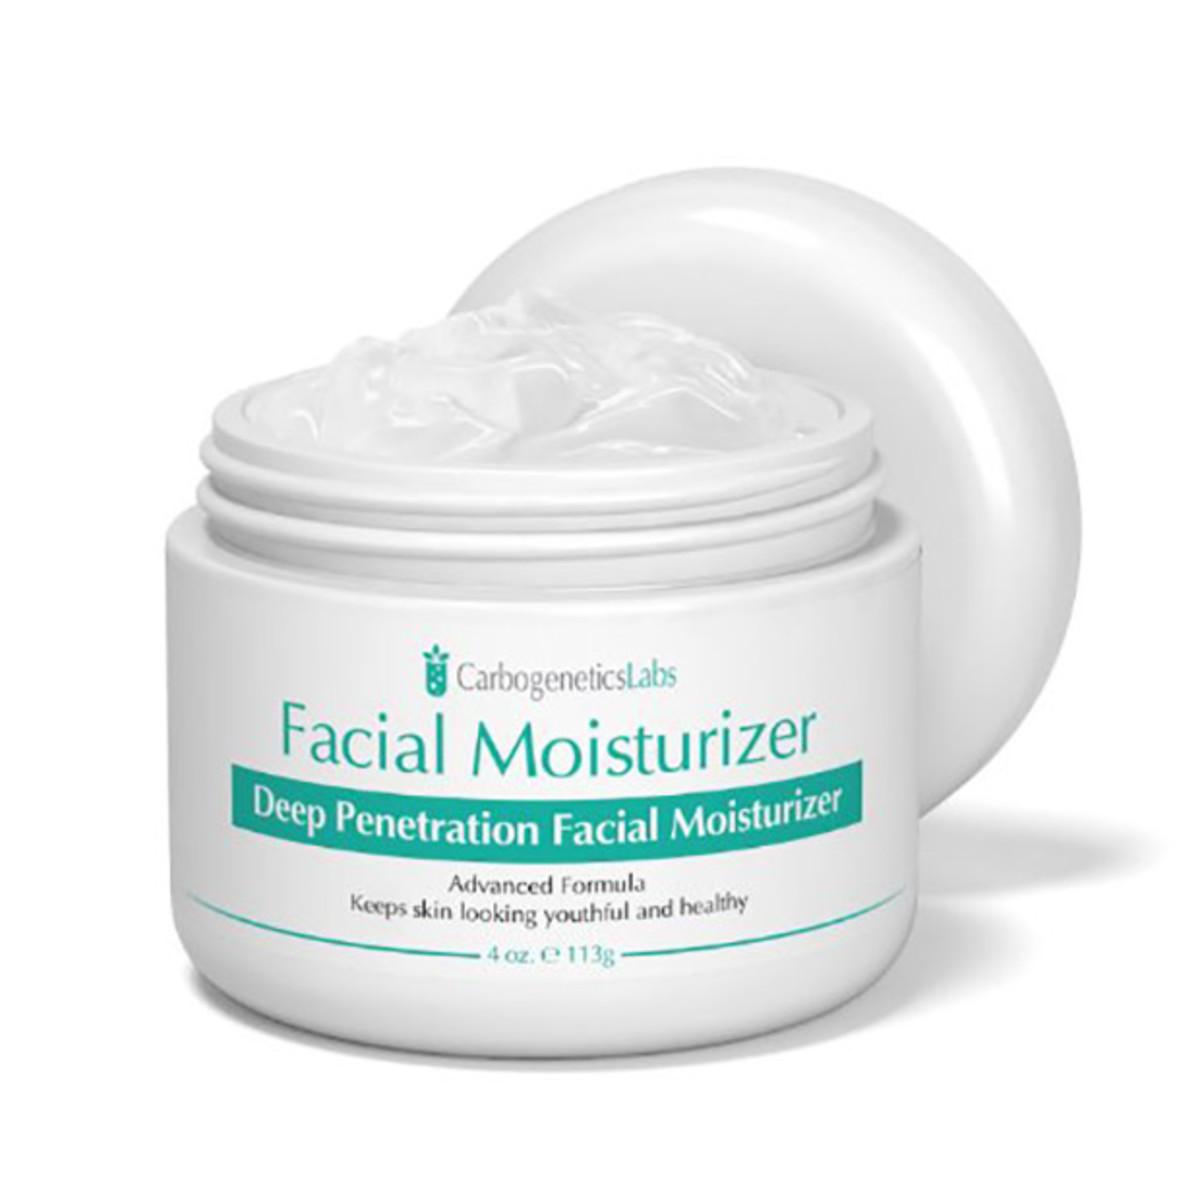 Carbogenetics Facial Moisturizer